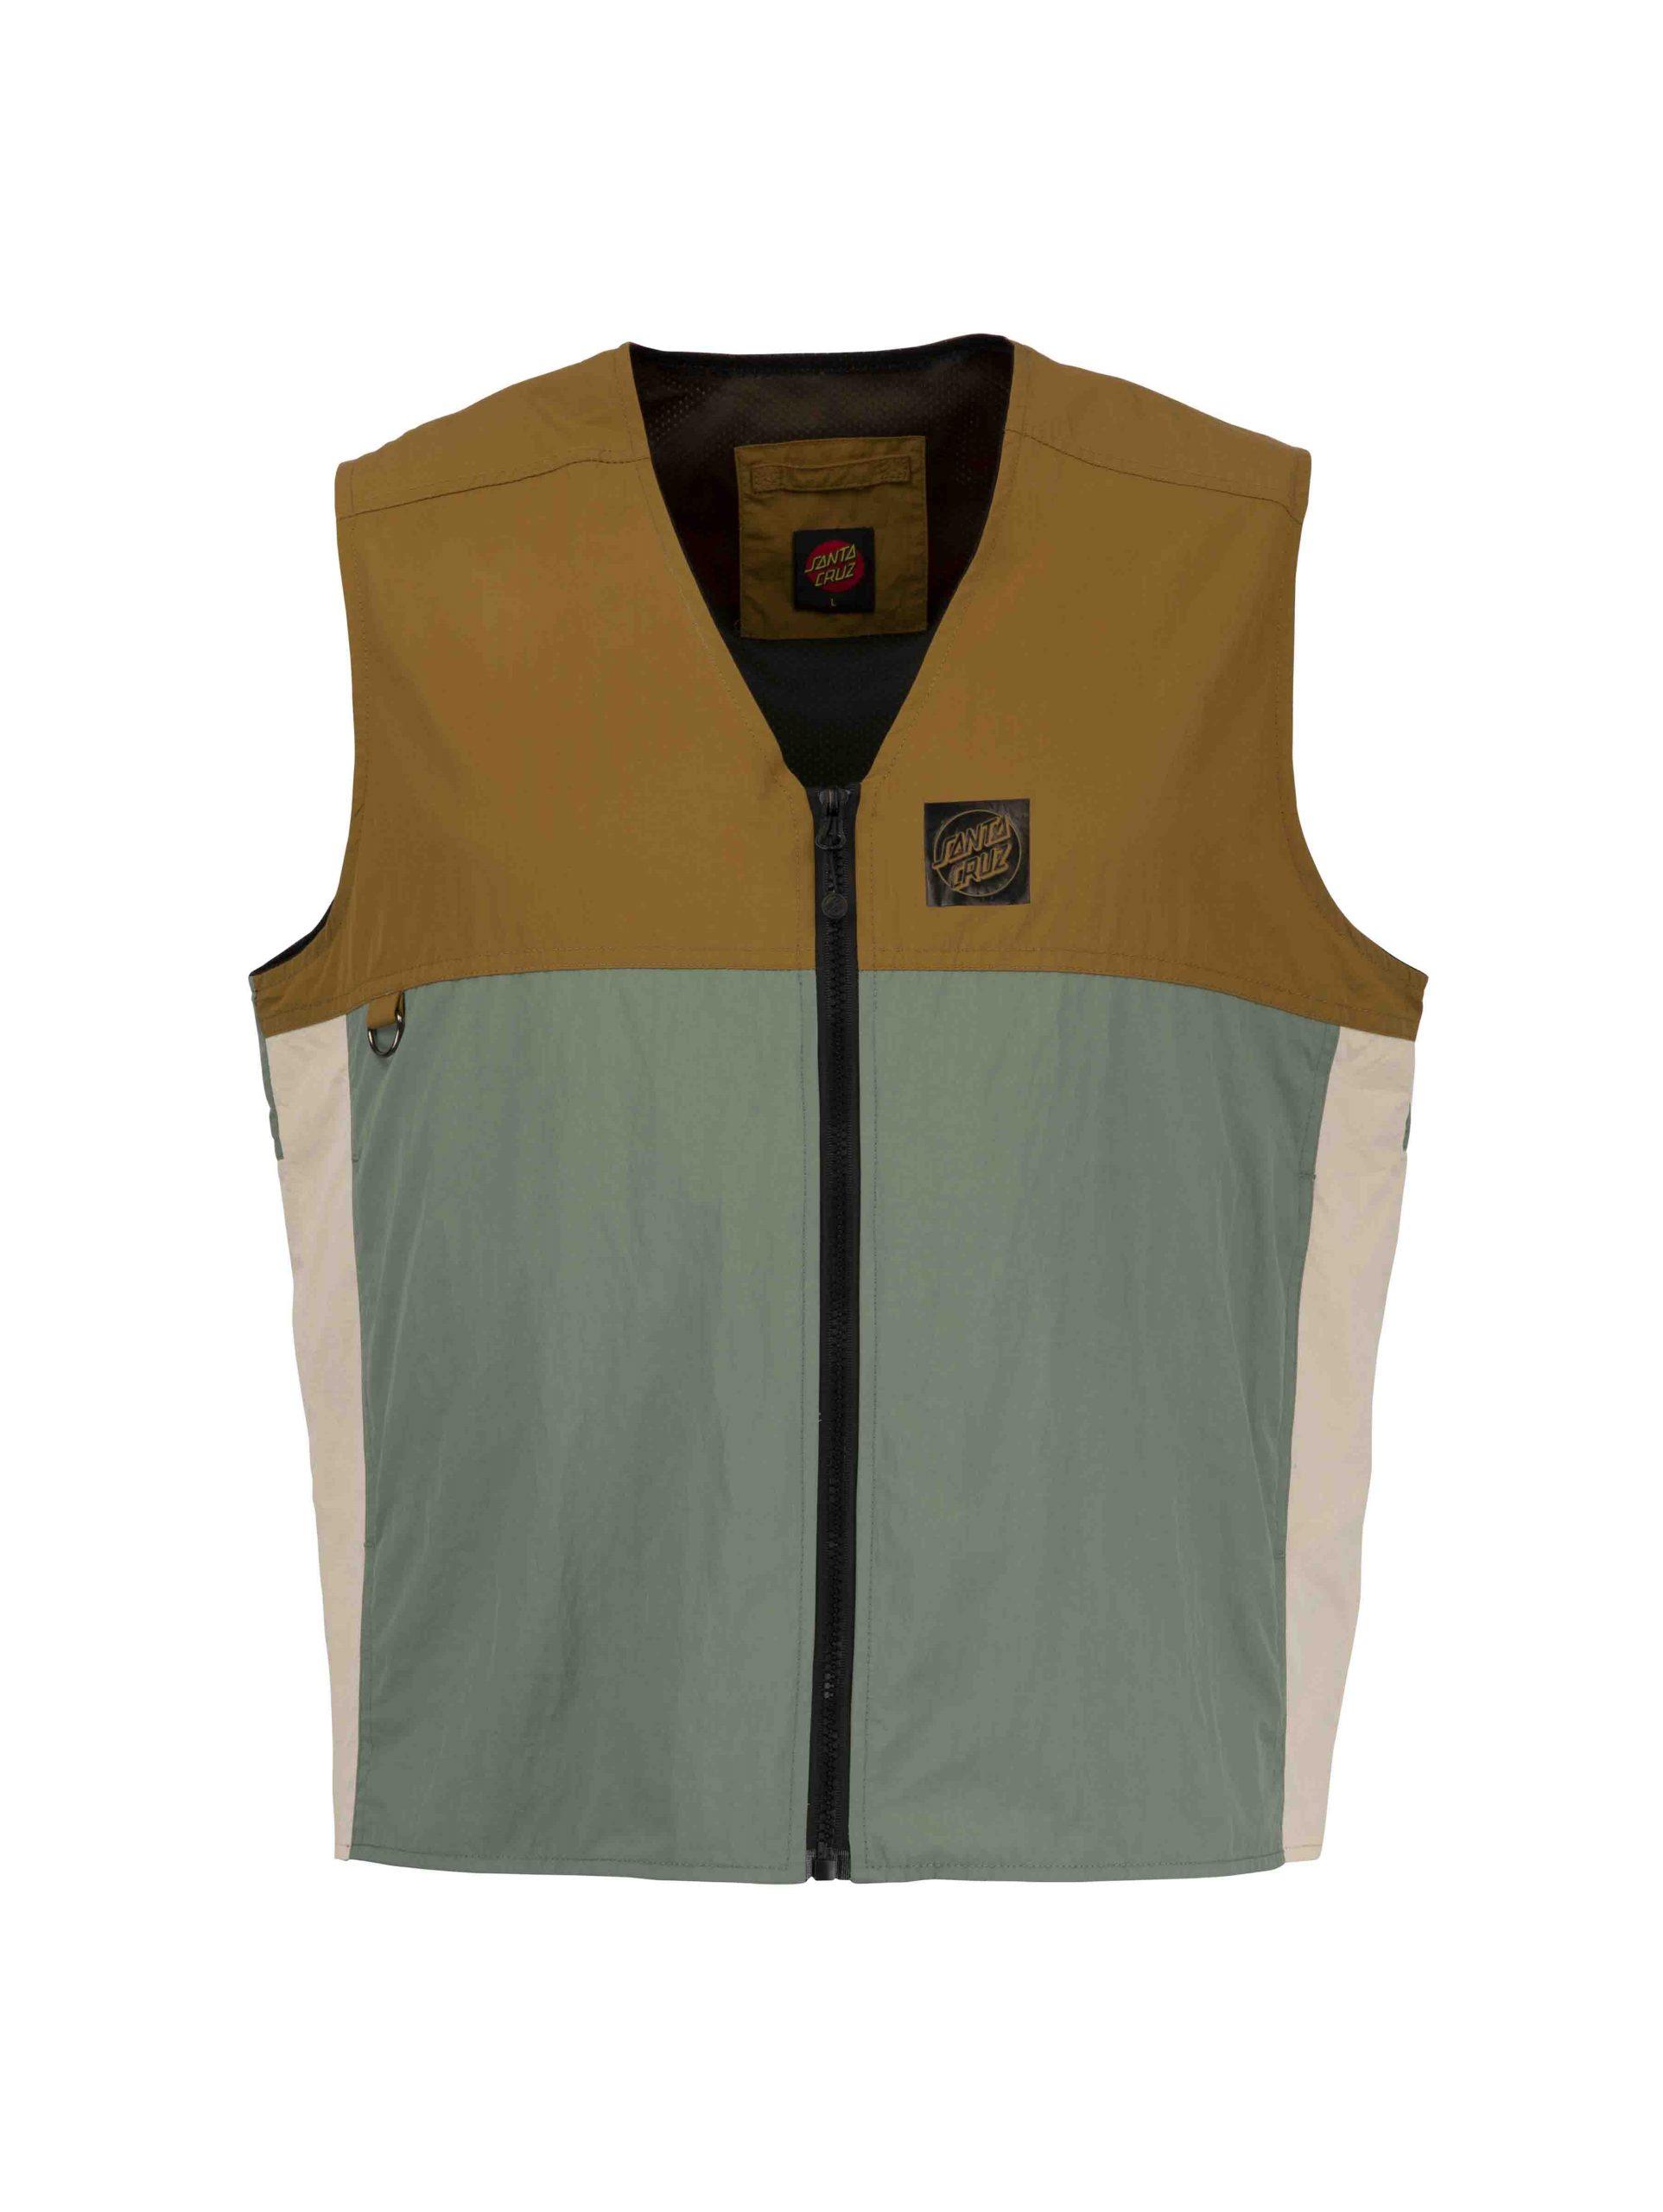 Santa Cruz S/S 2022 Men's Streetwear